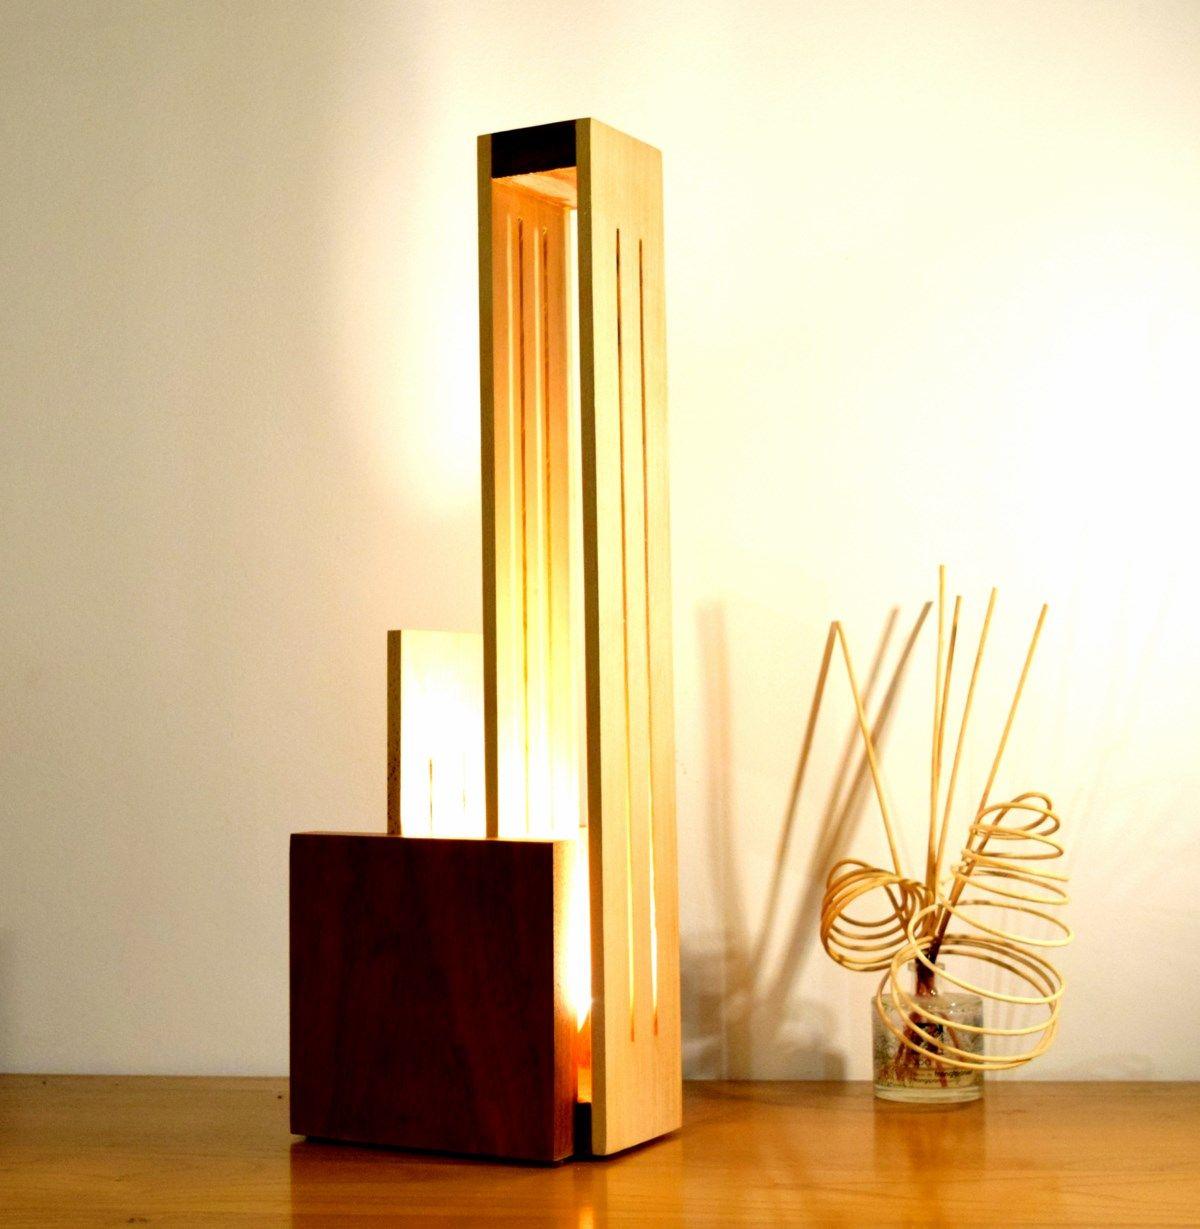 Xibano Lampes En Bois Design Woodlampdesign France Lampe Bois Eclairage Led Lampe